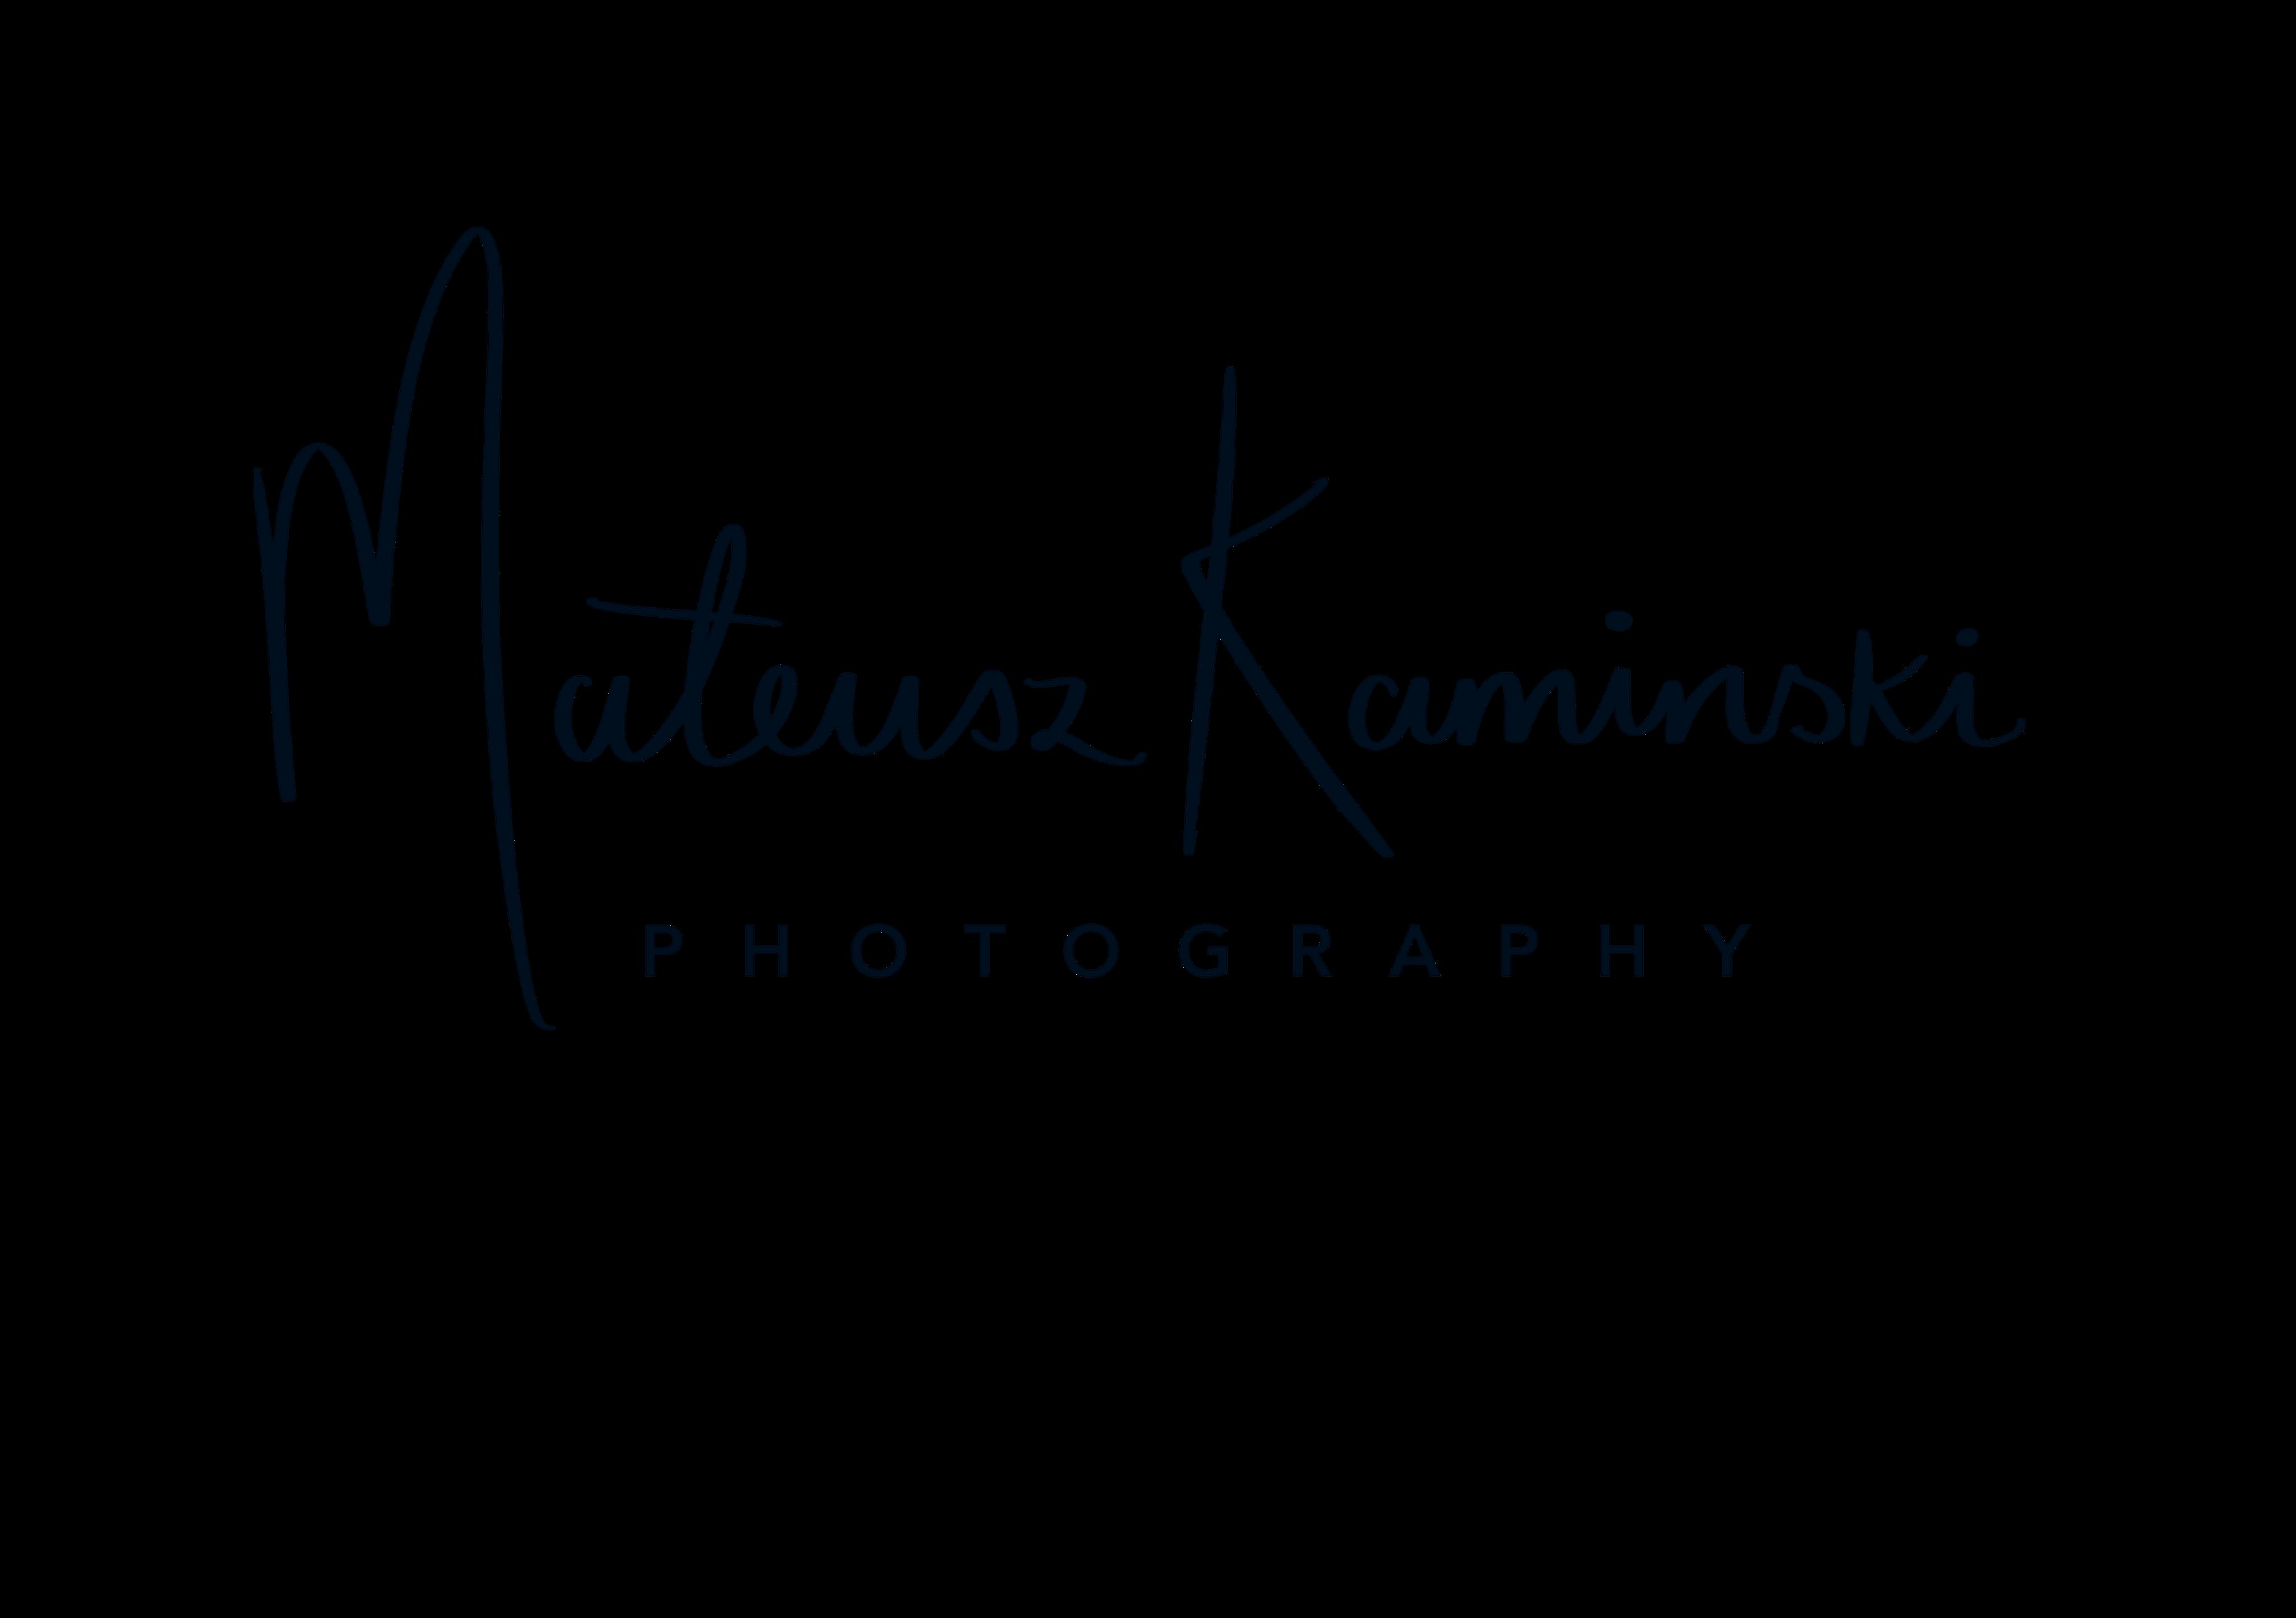 Mateusz kaminski